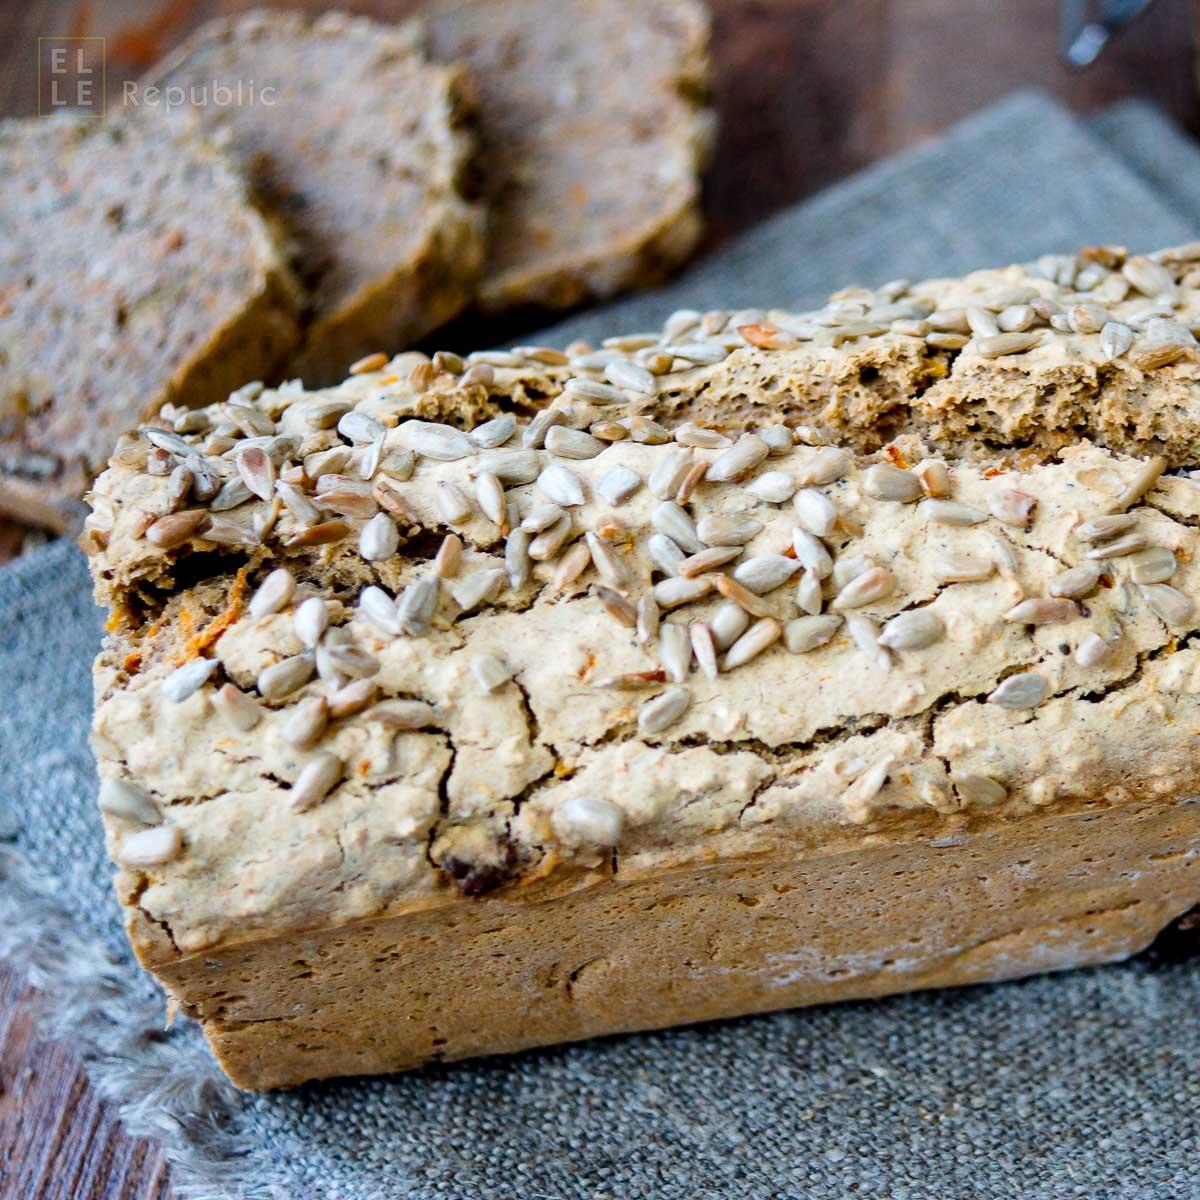 Buchweizenbrot Vegan Glutenfrei Einfaches Rezept Elle Republic